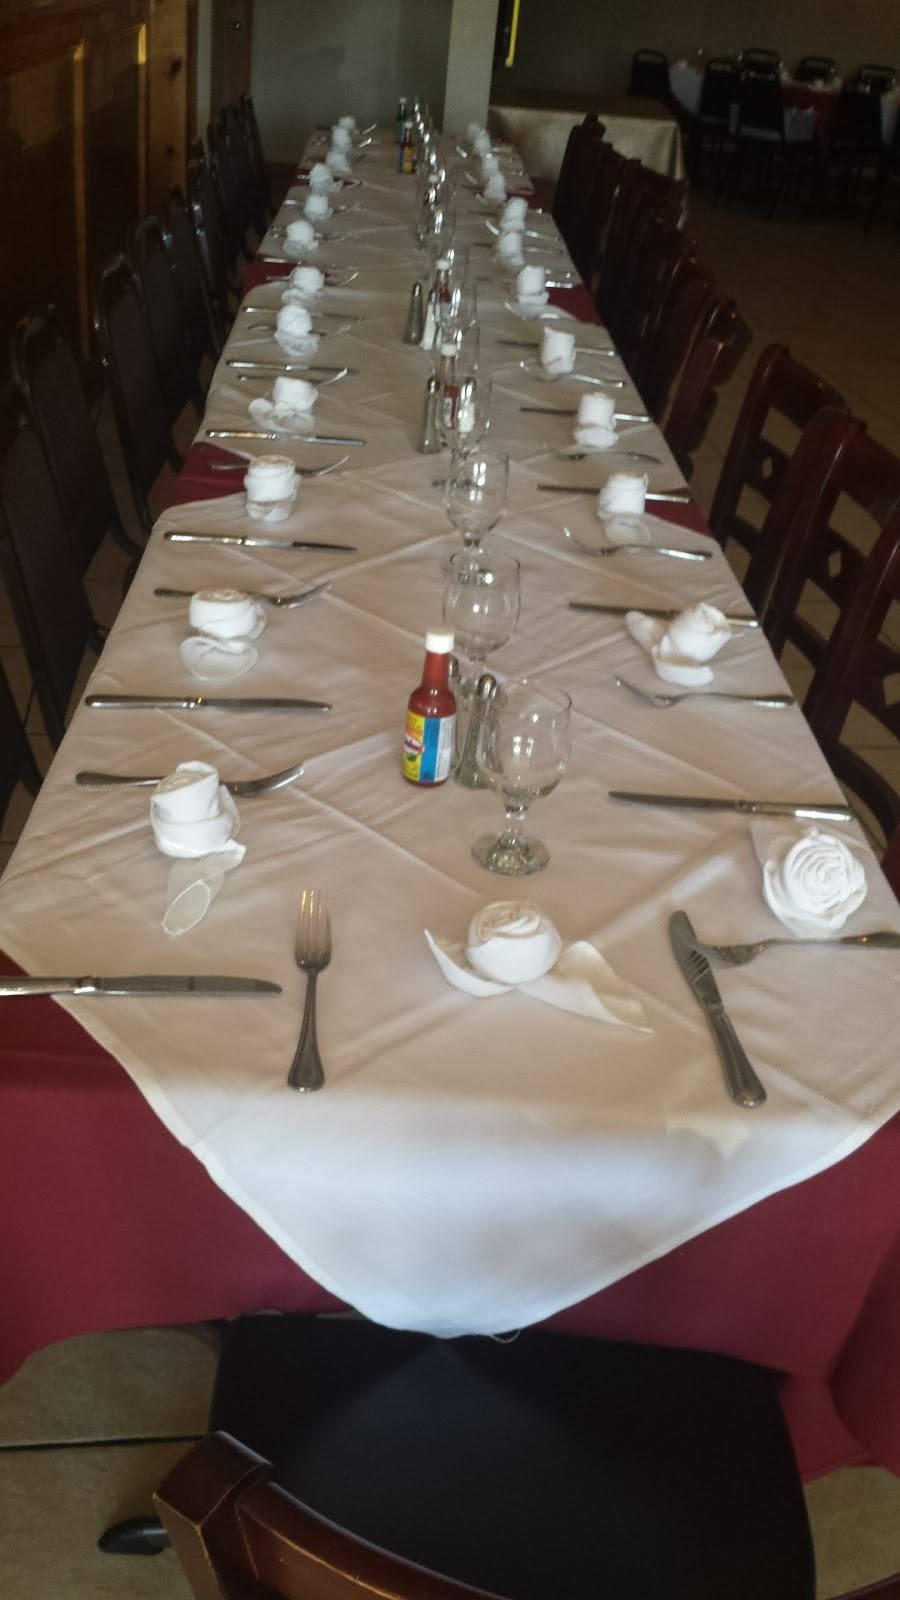 El Paraiso Restaurant - restaurant  | Photo 6 of 10 | Address: 6515 New Hampshire Ave, Takoma Park, MD 20912, USA | Phone: (301) 270-1190